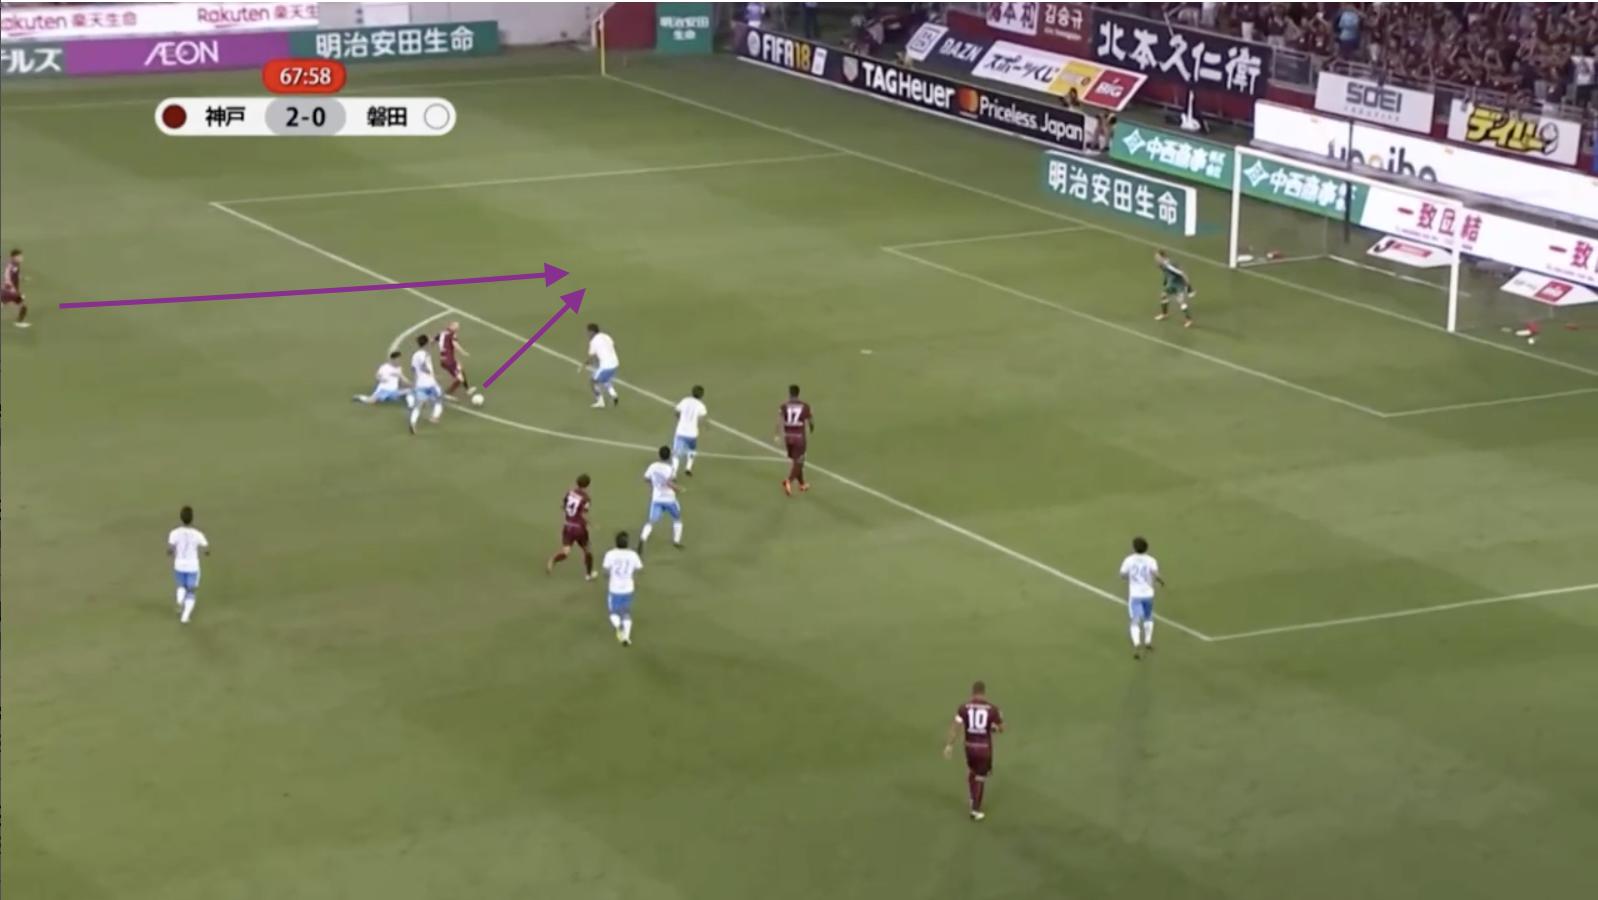 Andres Iniesta Vissel Kobe Tactical Analysis Statistics